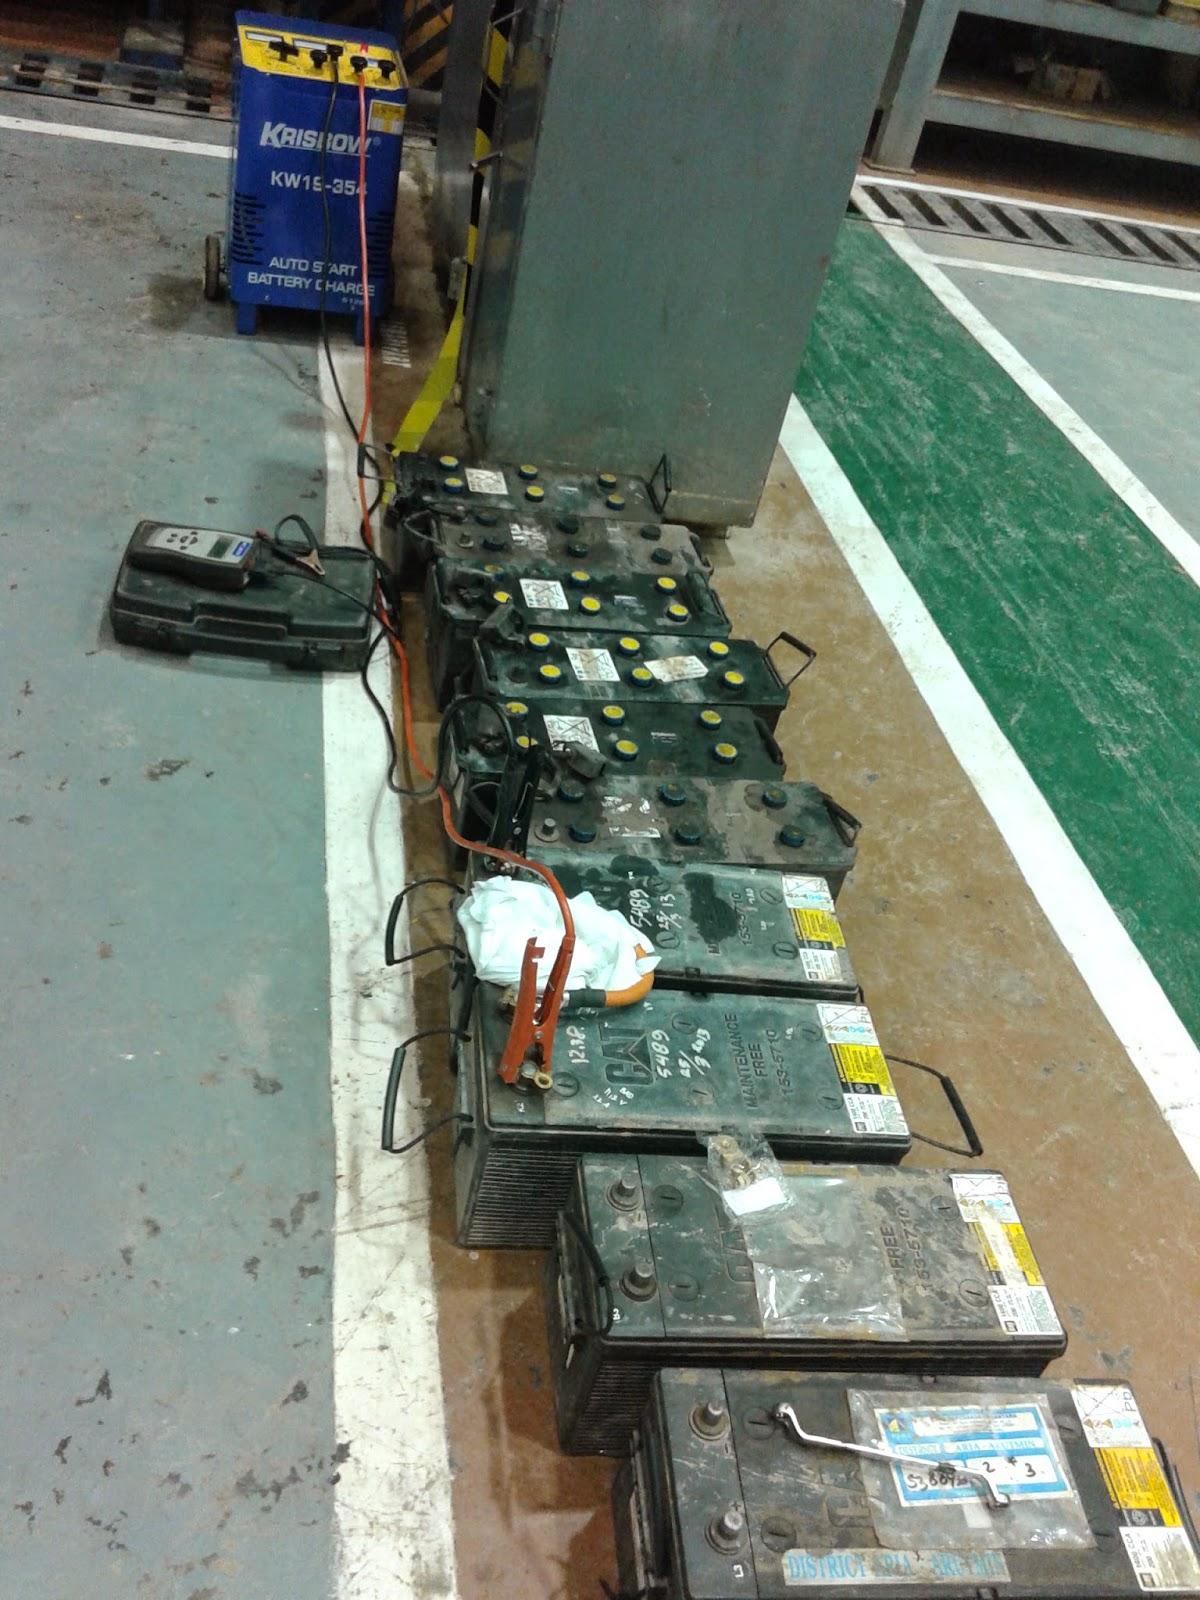 Blora Ari Ayik Belajar Aki Cara Ngecas Battery Sistem Fungsi Dan